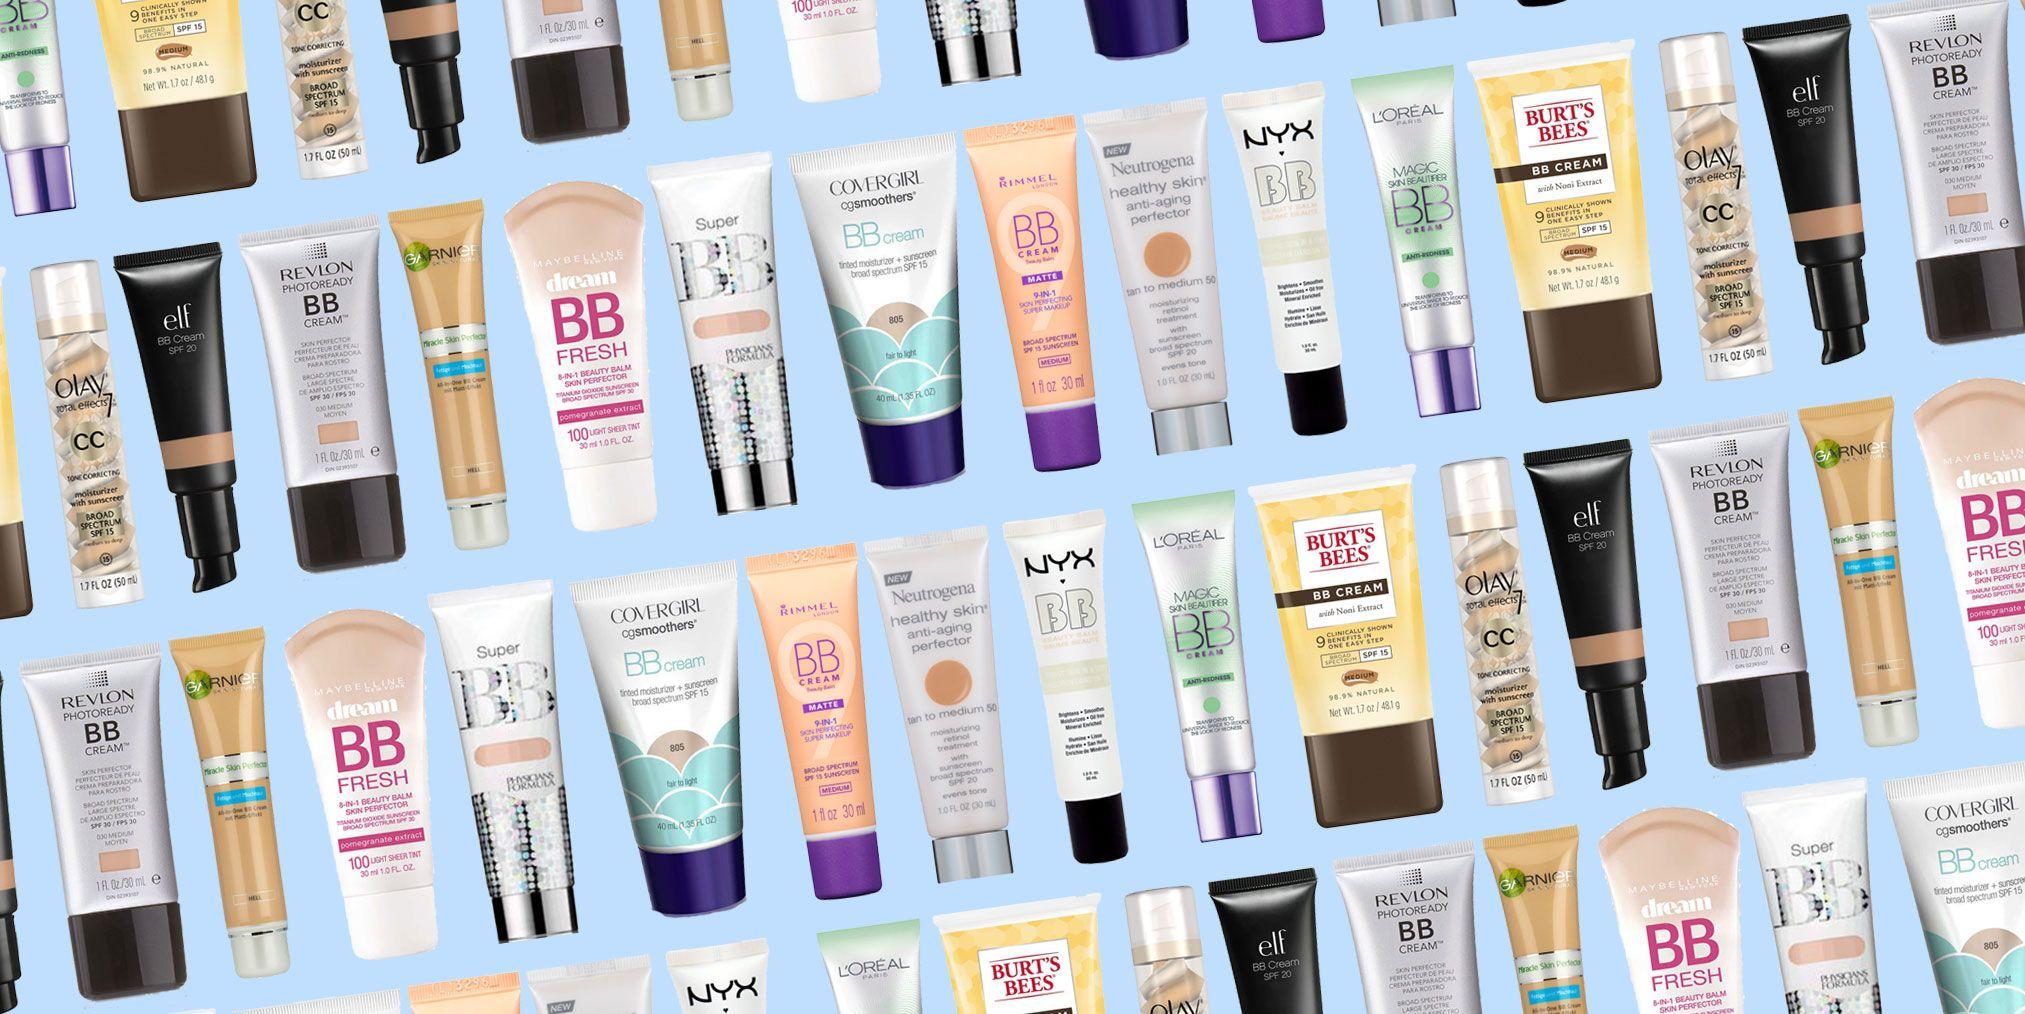 10 Best Drugstore Bb Creams Of 2018 Best All In One Beauty Balms